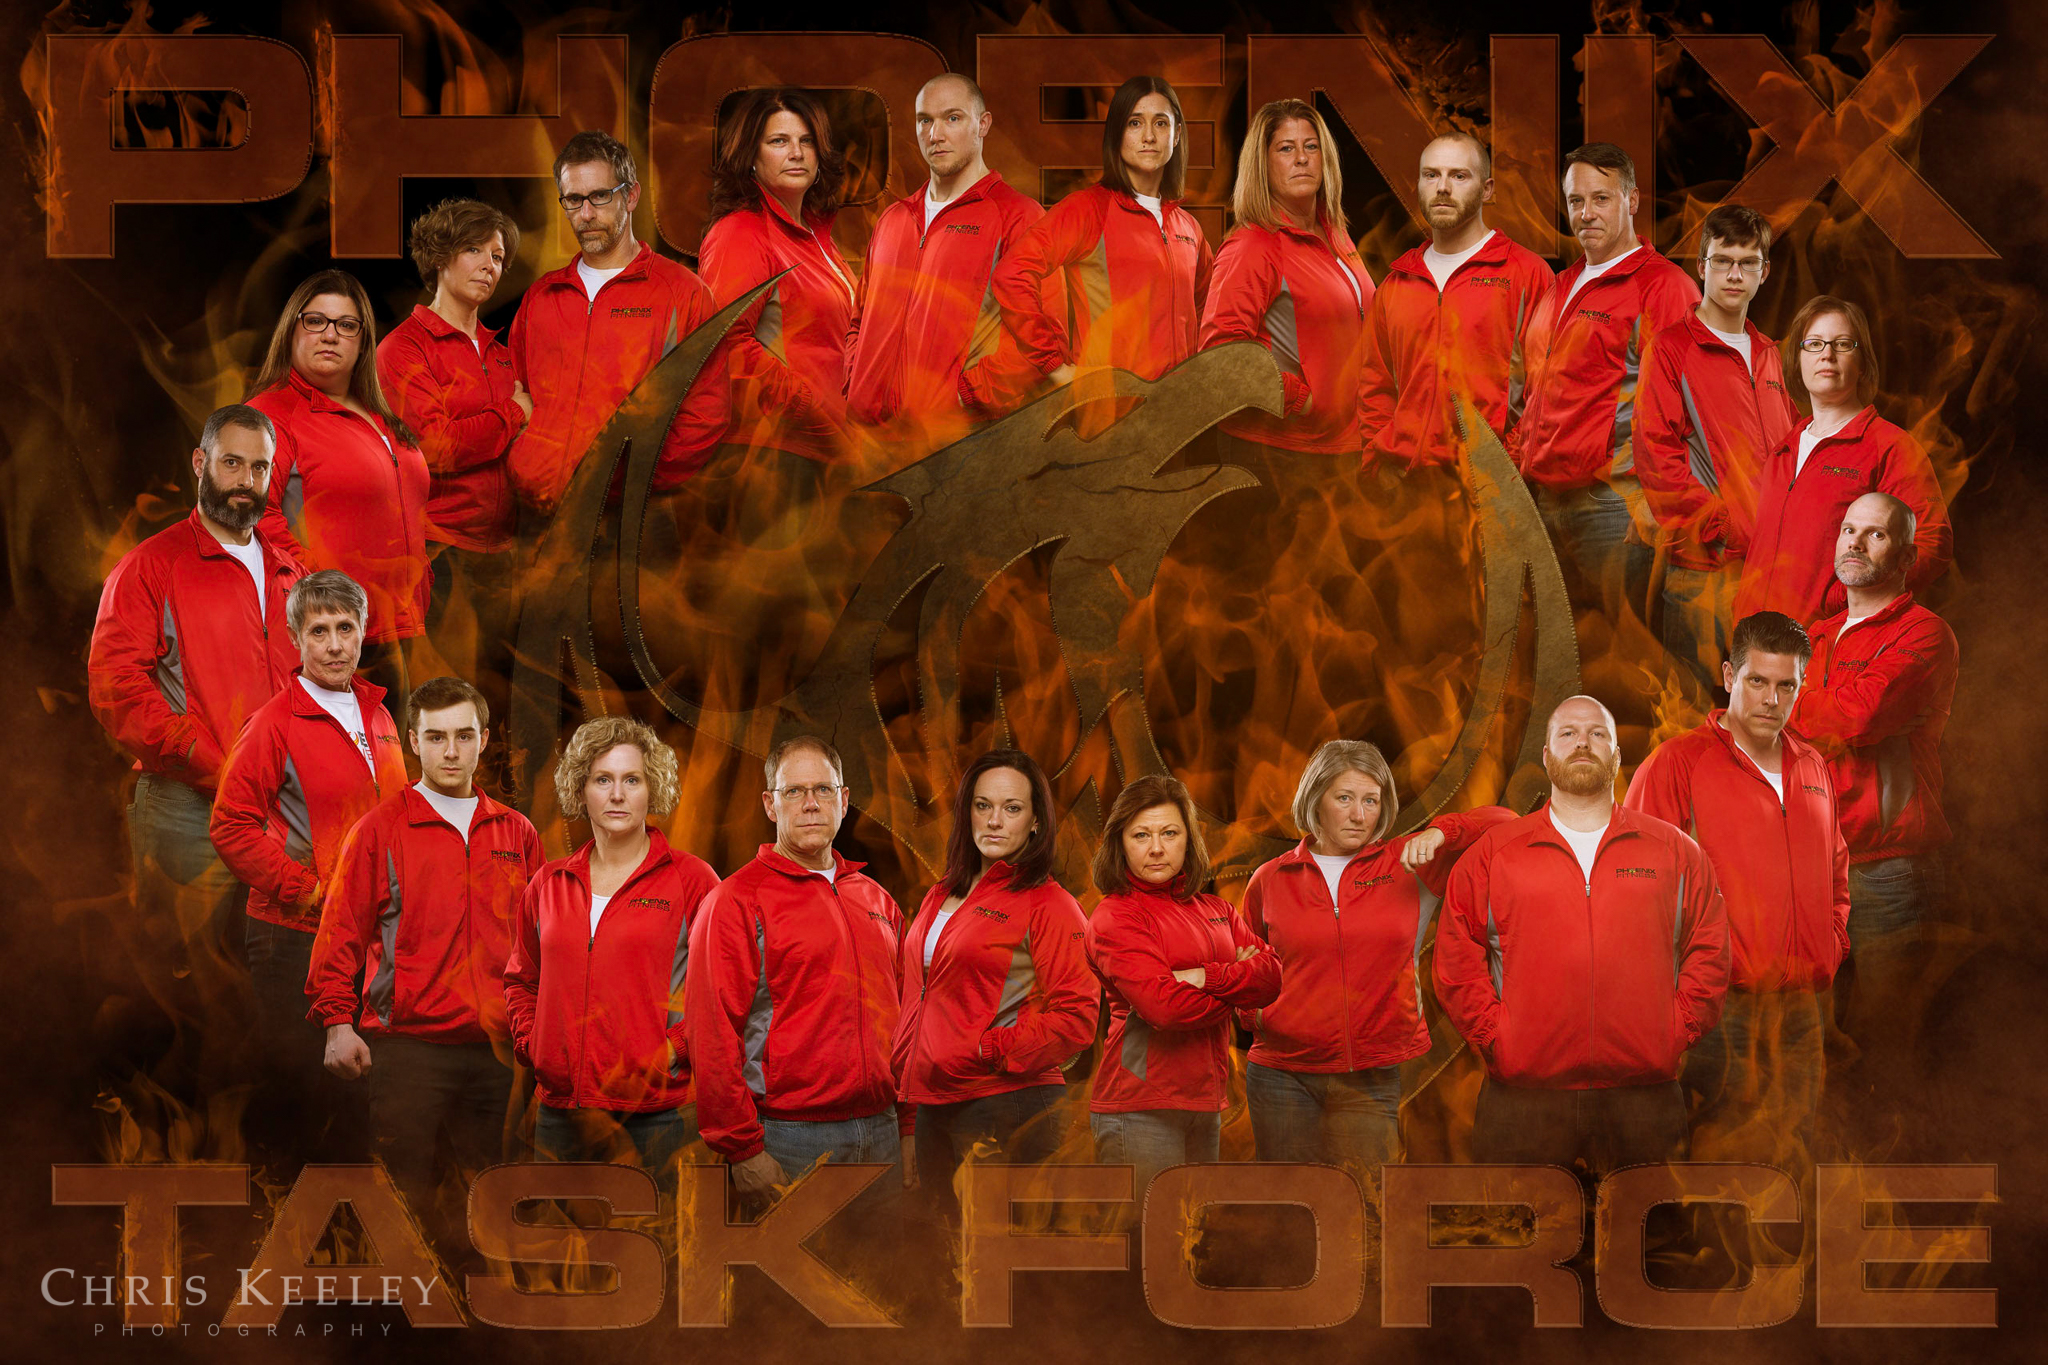 phoenix-task-force-chris-keeley-photography